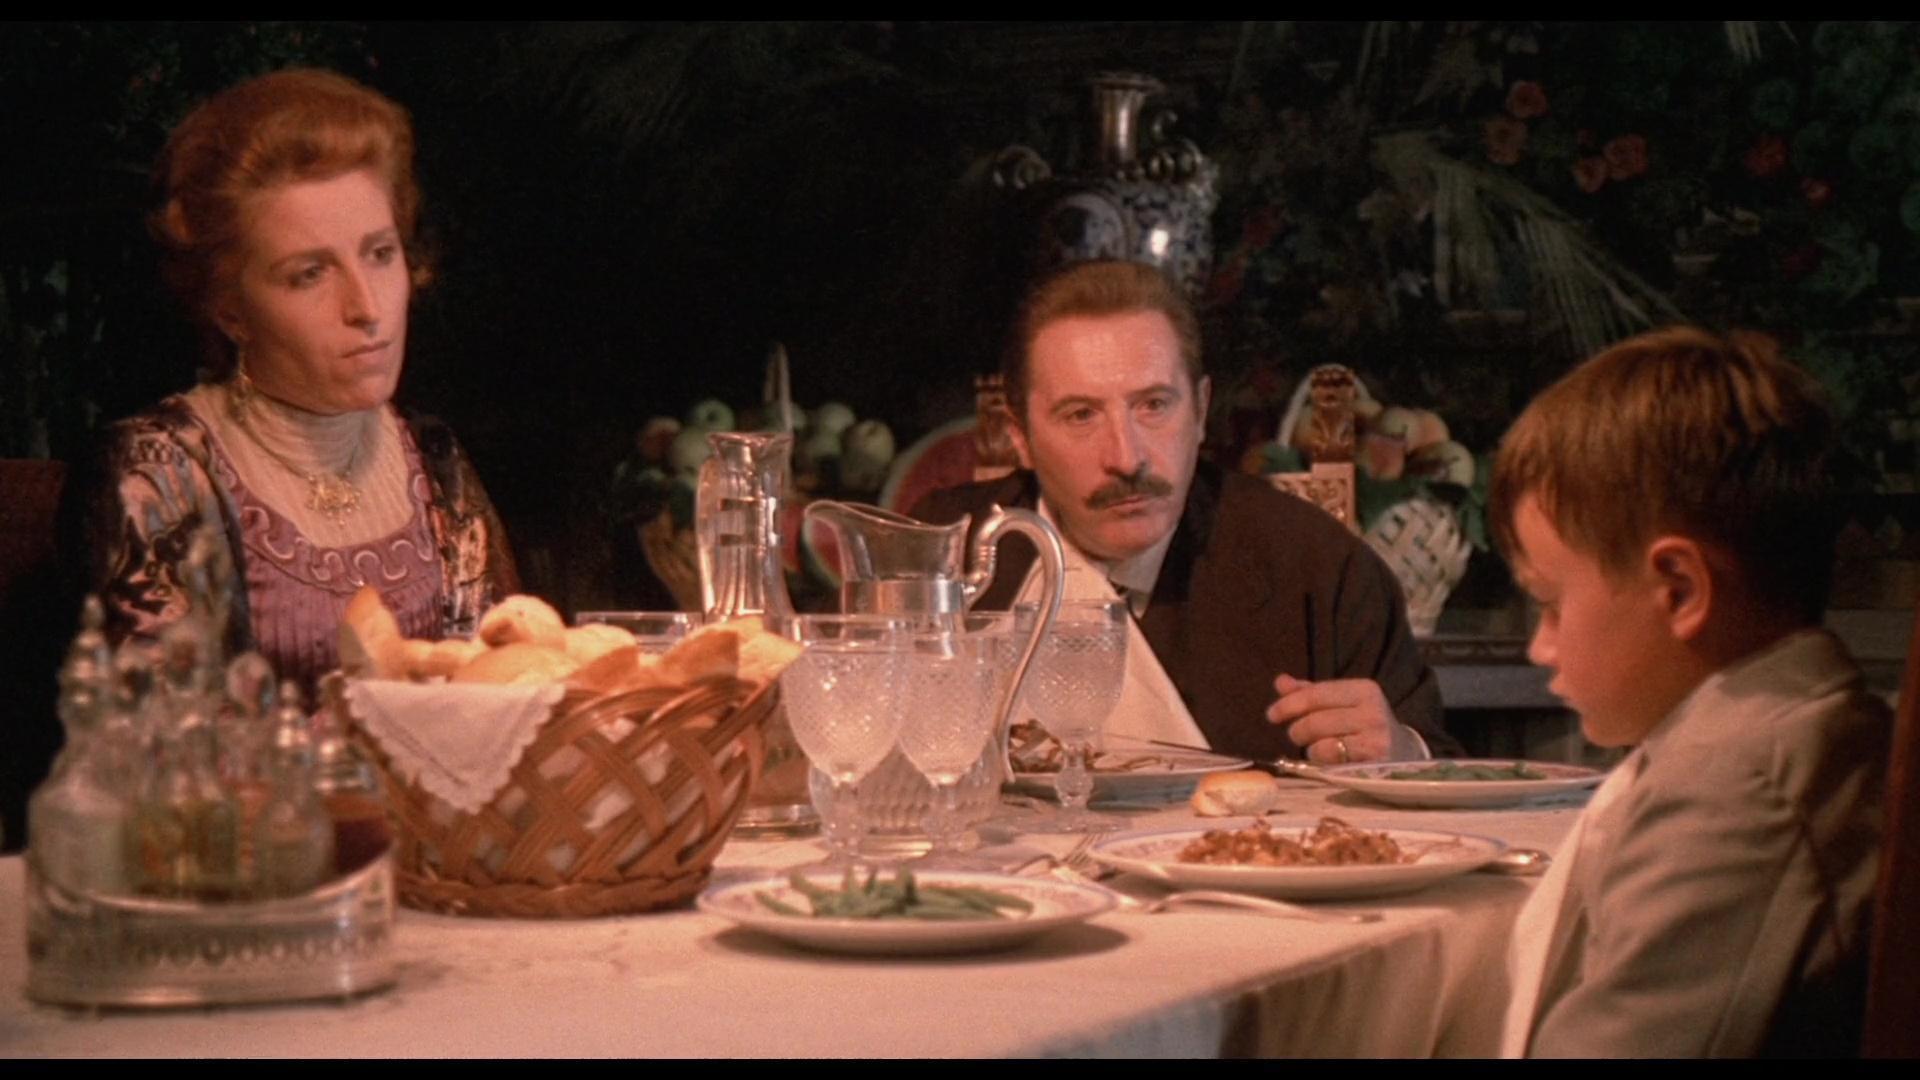 Russell Brand (born 1975),Francesca Inaudi Adult movies Laura Morante (born 1956),Haidee Wright